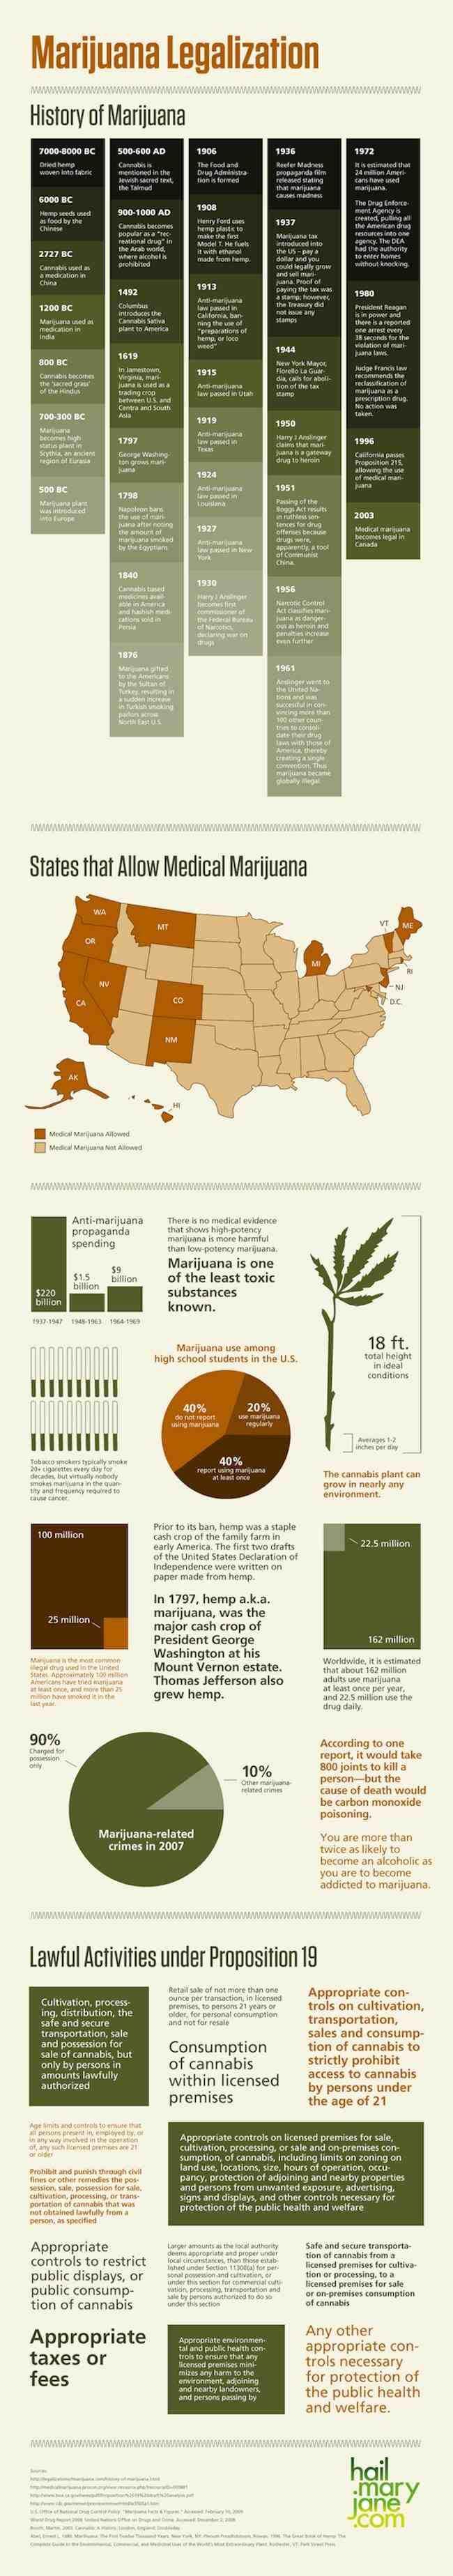 Marijuana Legalization: An Infographic | Marijuana and Cannabis News | Toke of the Town